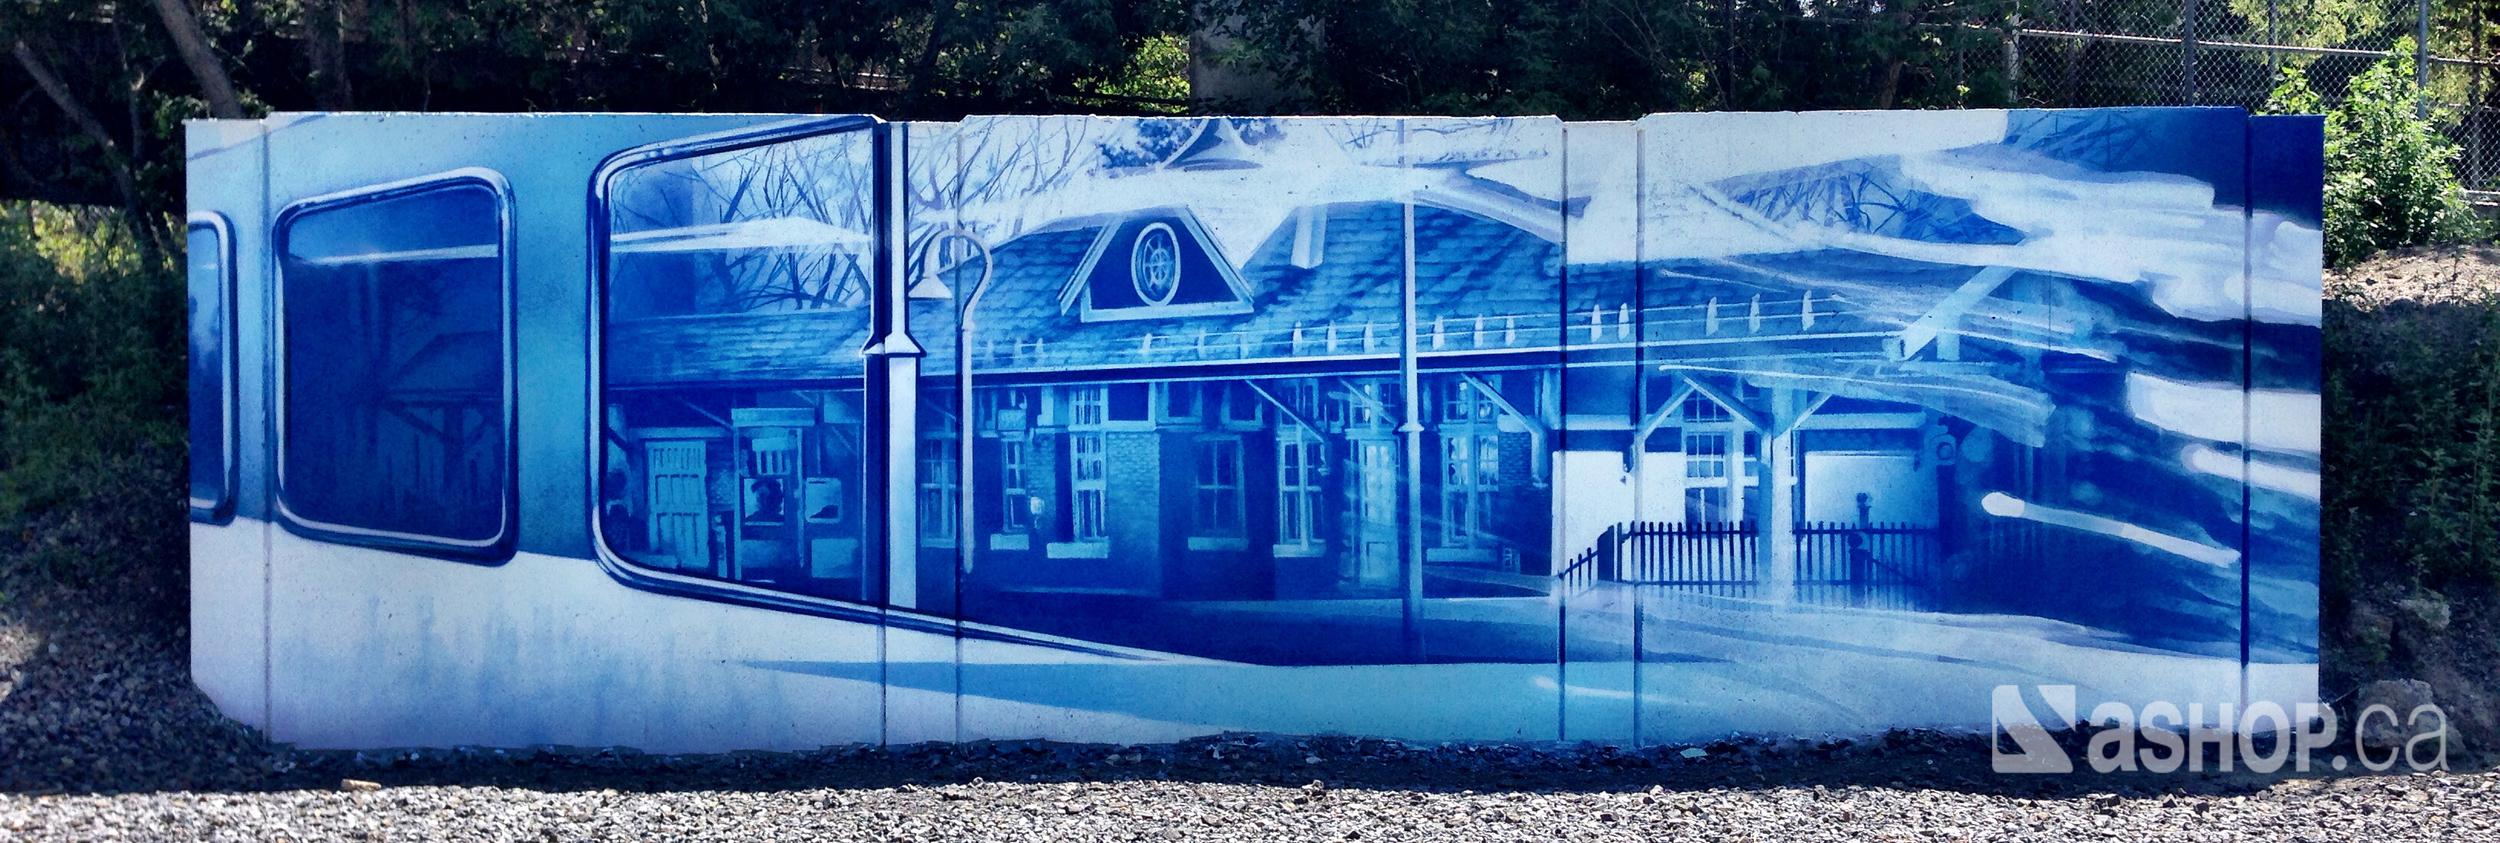 ashop-a'shop-graffiti-mural-street-art-urban-zek-zeko-zeck-AMT-train-station-ndg.JPG